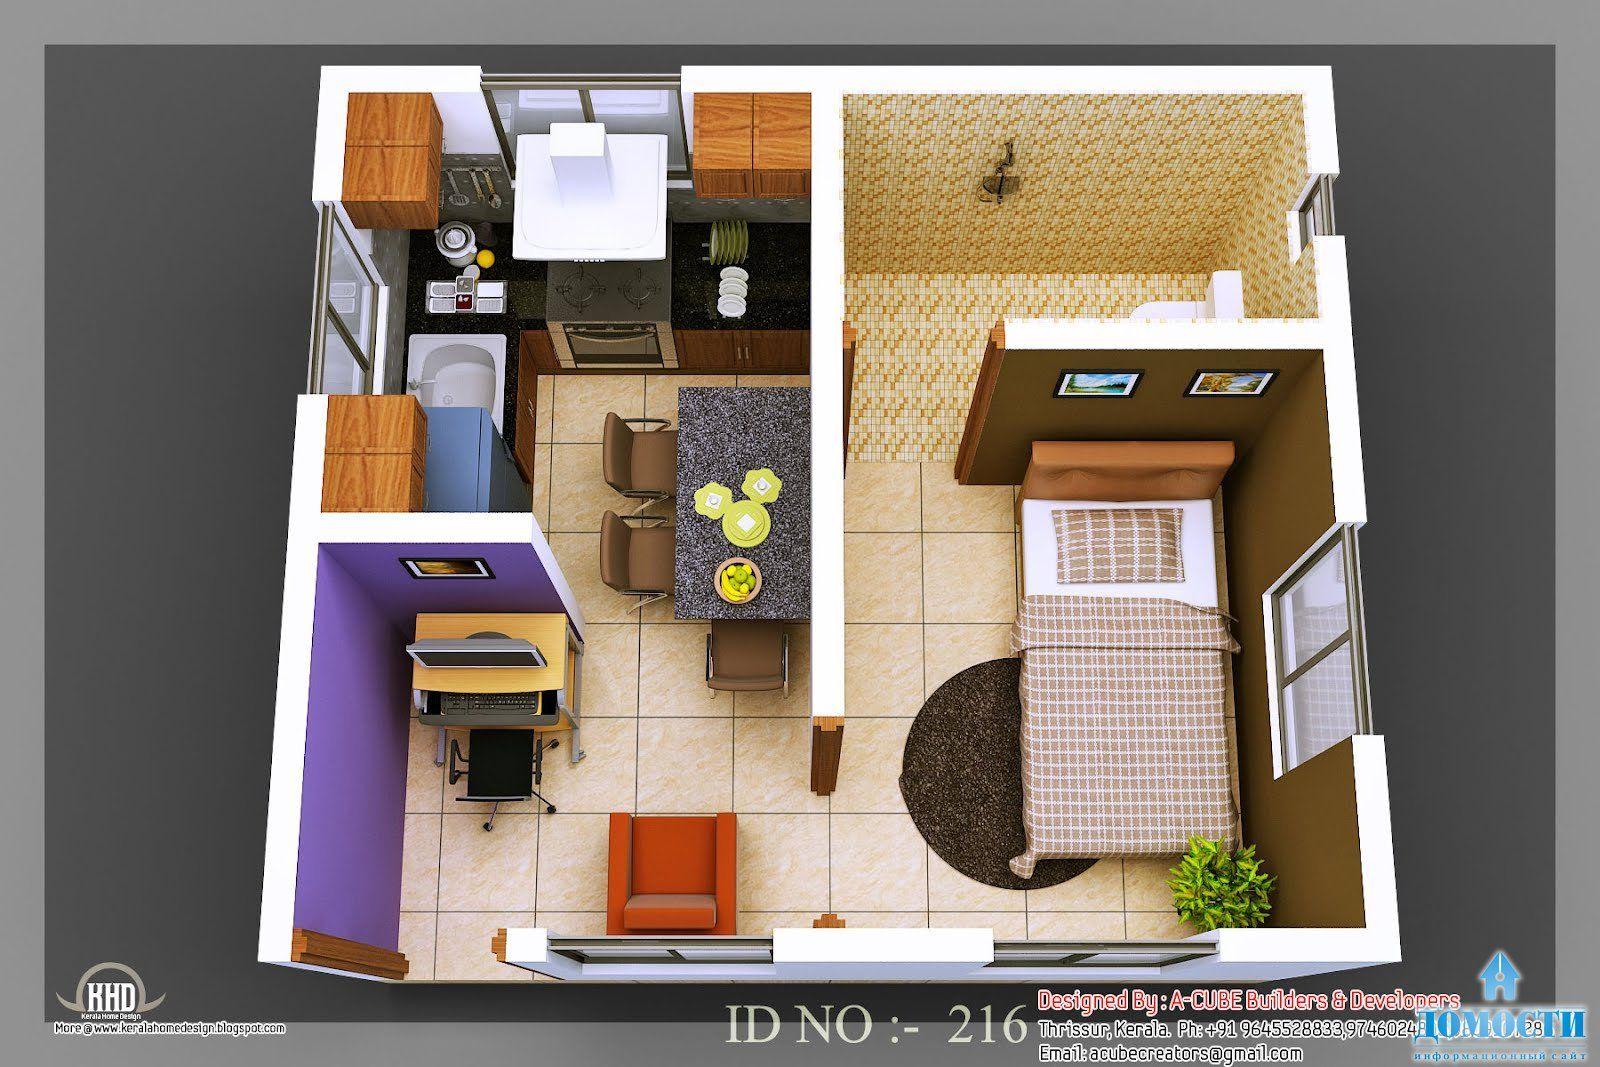 Astounding 100 Sq Meter House Plan Images   Exterior Ideas 3D   Gaml .